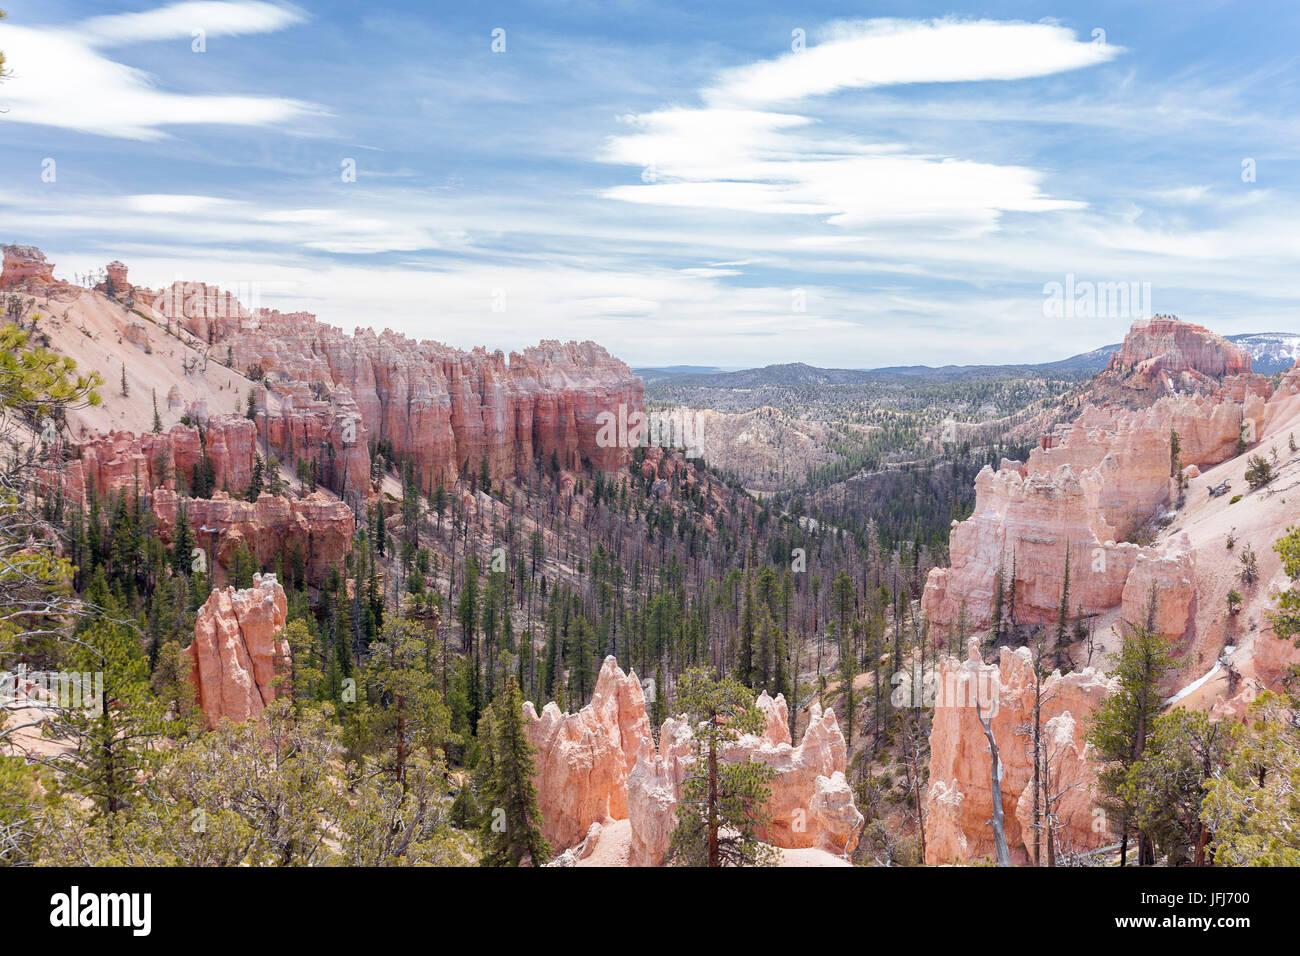 View at rock pyramids in Bryce Canyon Nationalpark, Utah, the USA - Stock Image